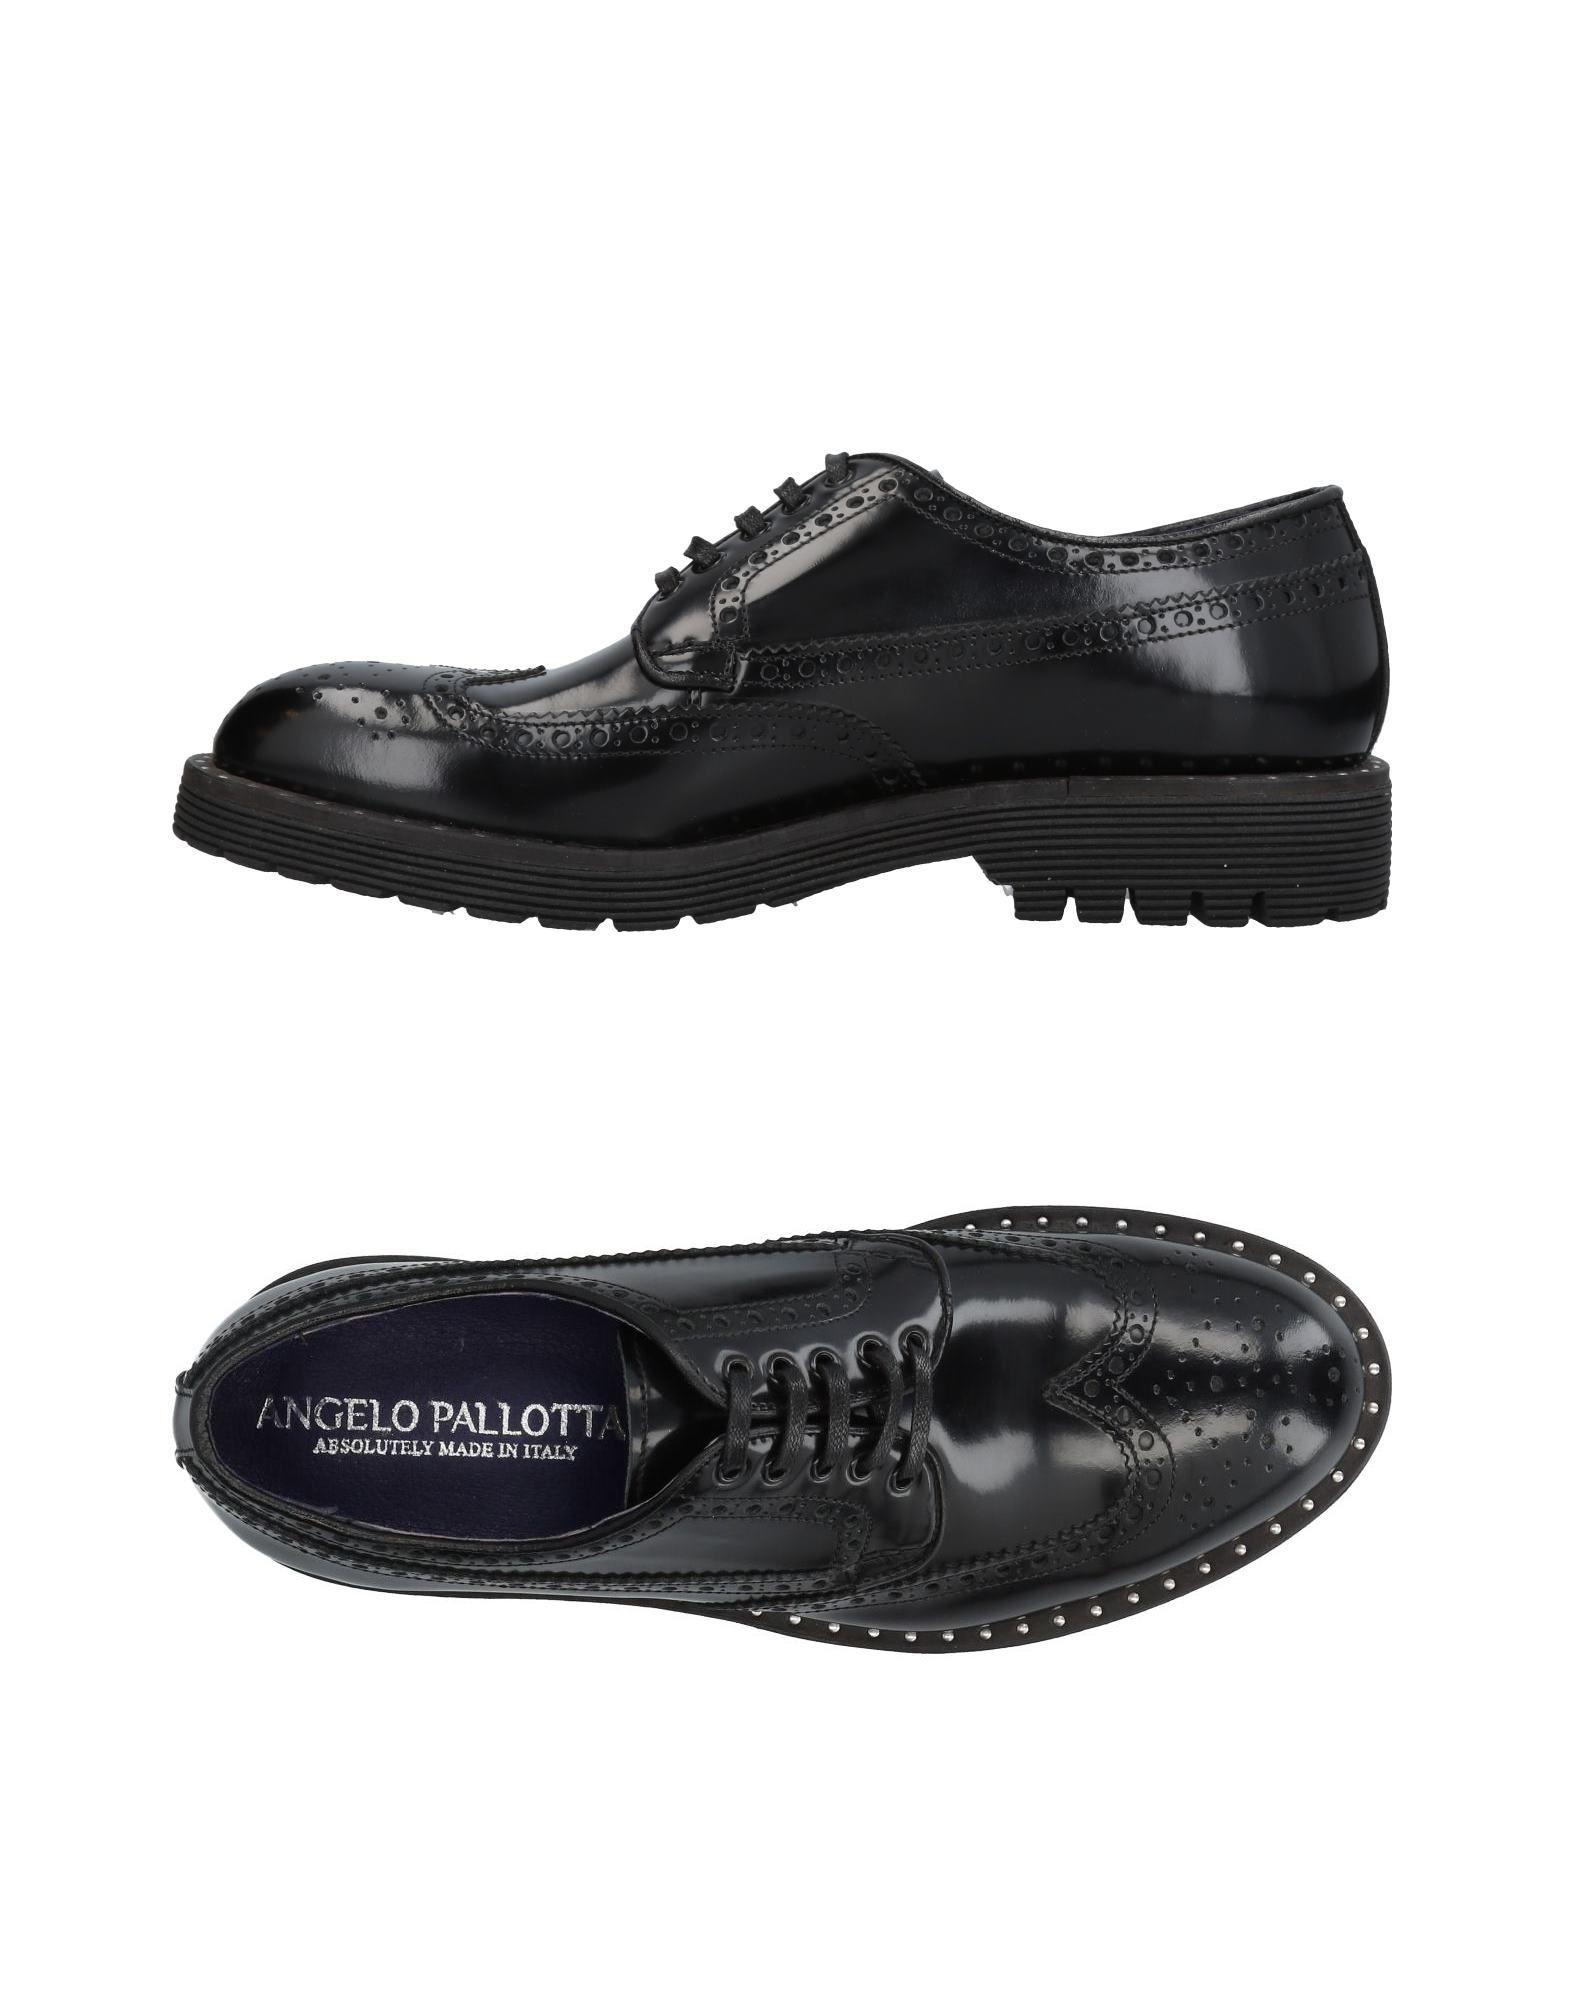 Angelo Pallotta Schnürschuhe Herren  11456206IQ Gute Qualität beliebte Schuhe